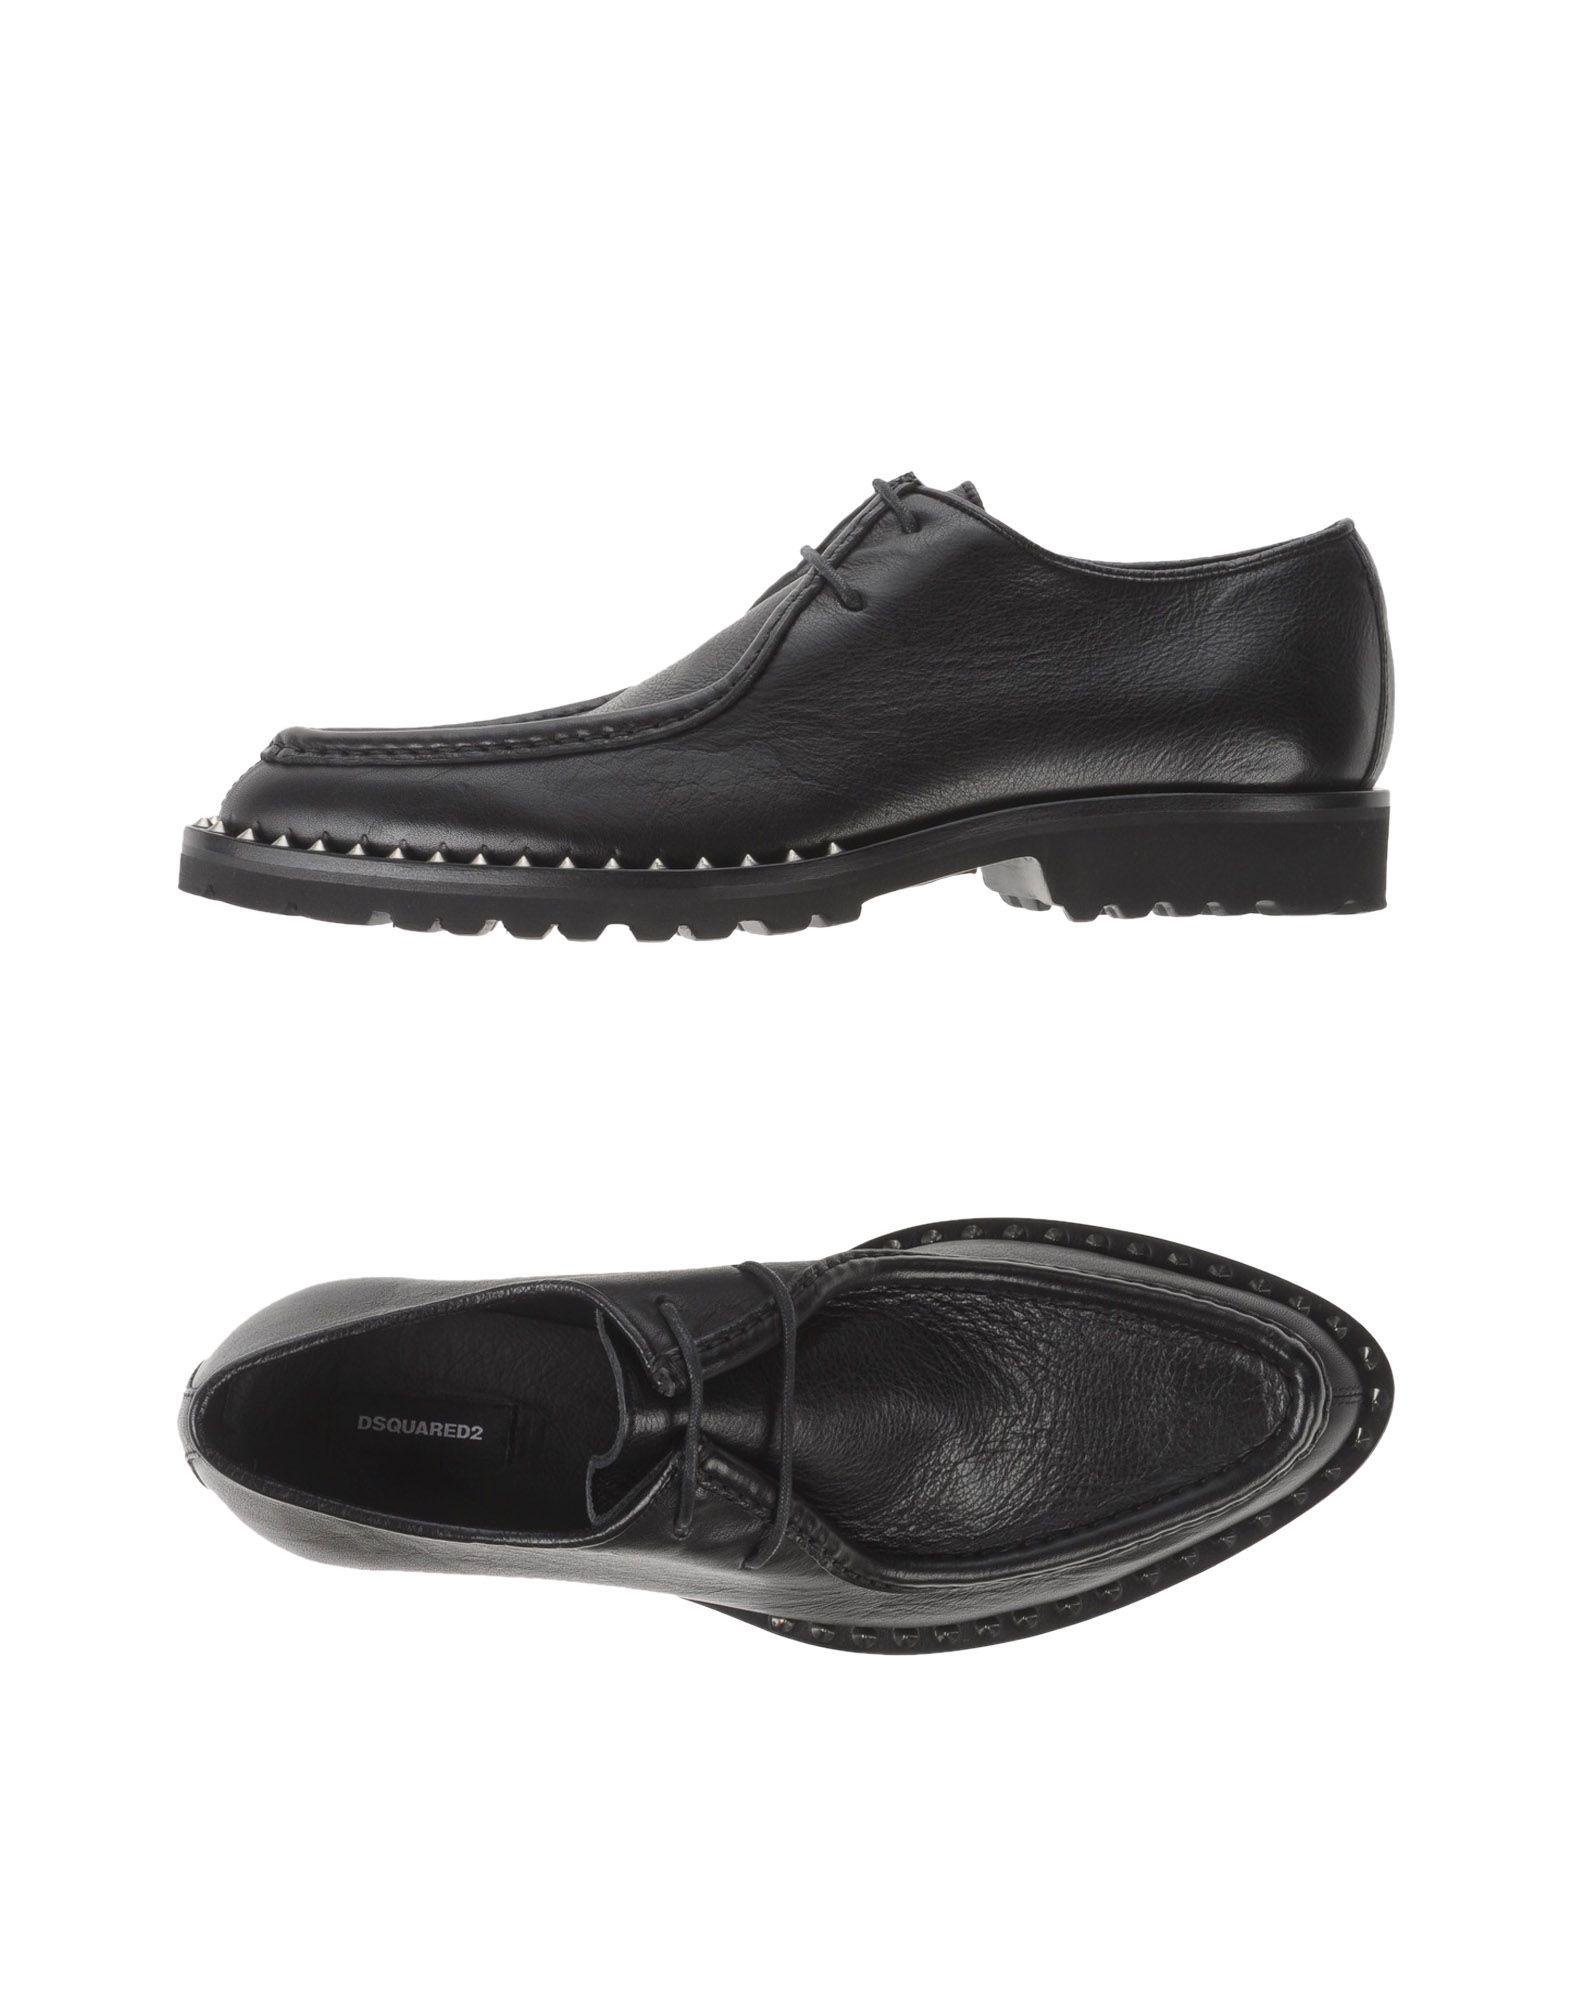 Фото - DSQUARED2 Обувь на шнурках обувь на высокой платформе dkny